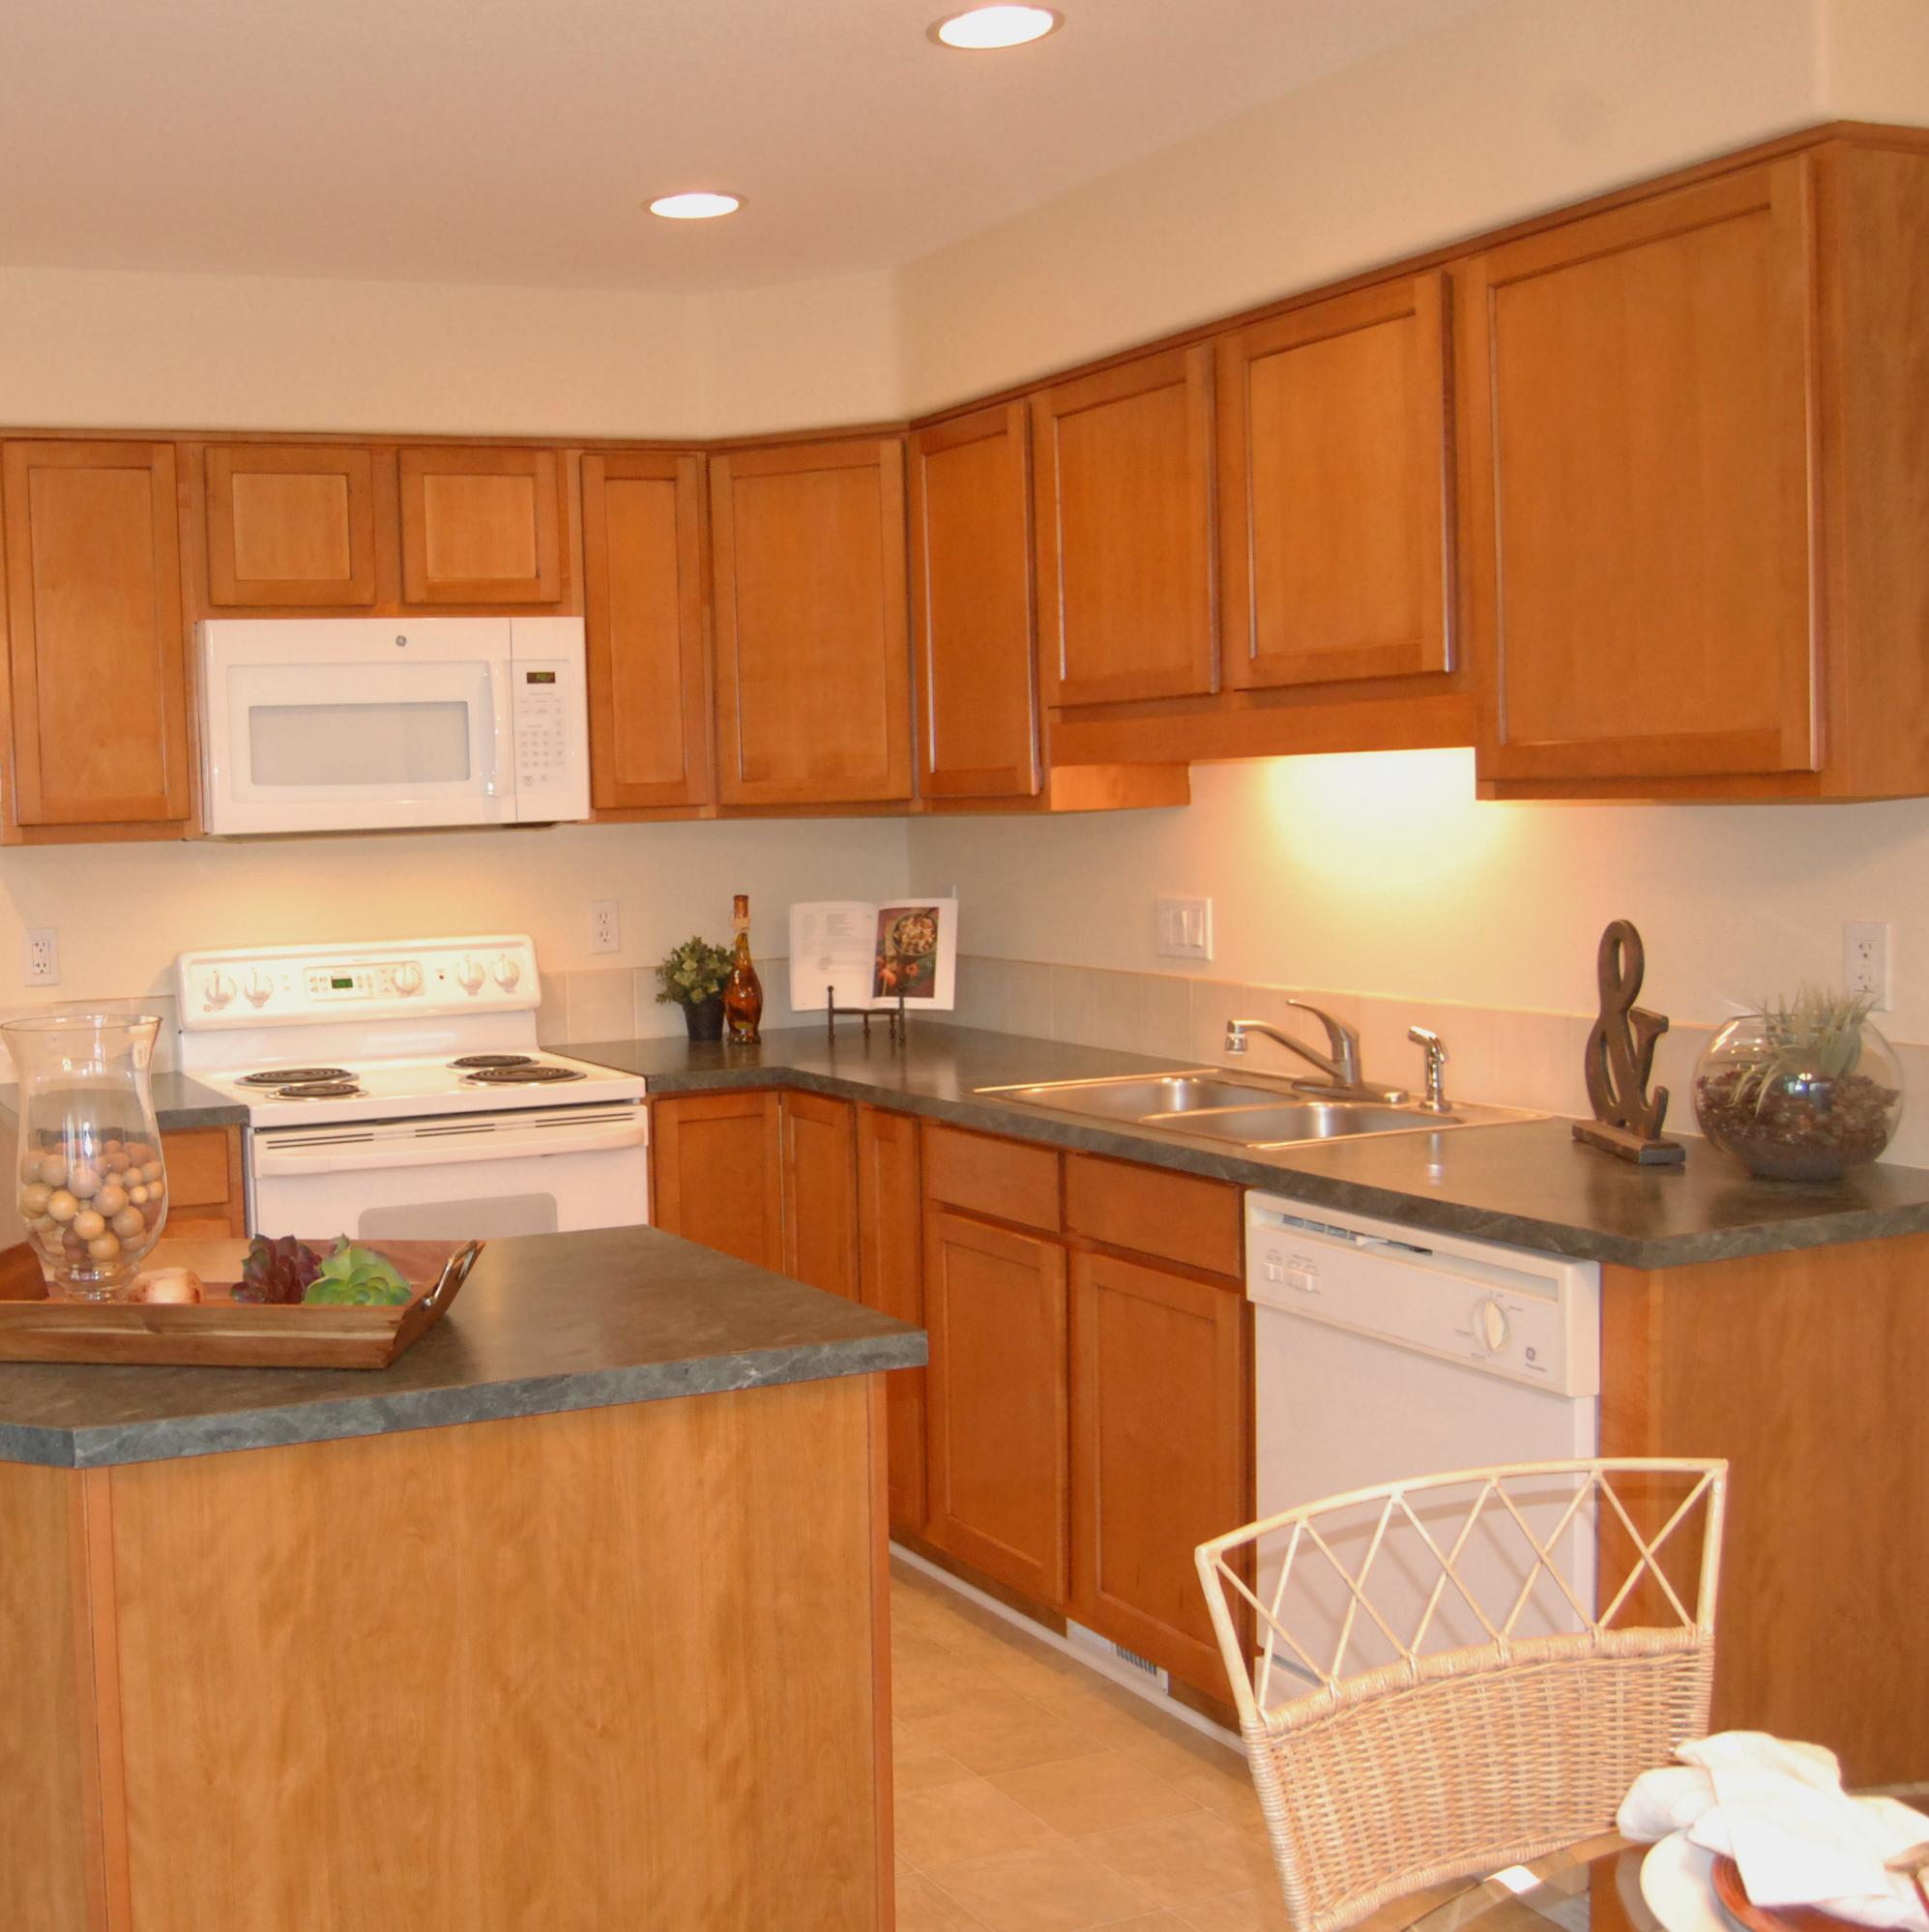 christine's kitchen without fridge area.jpg